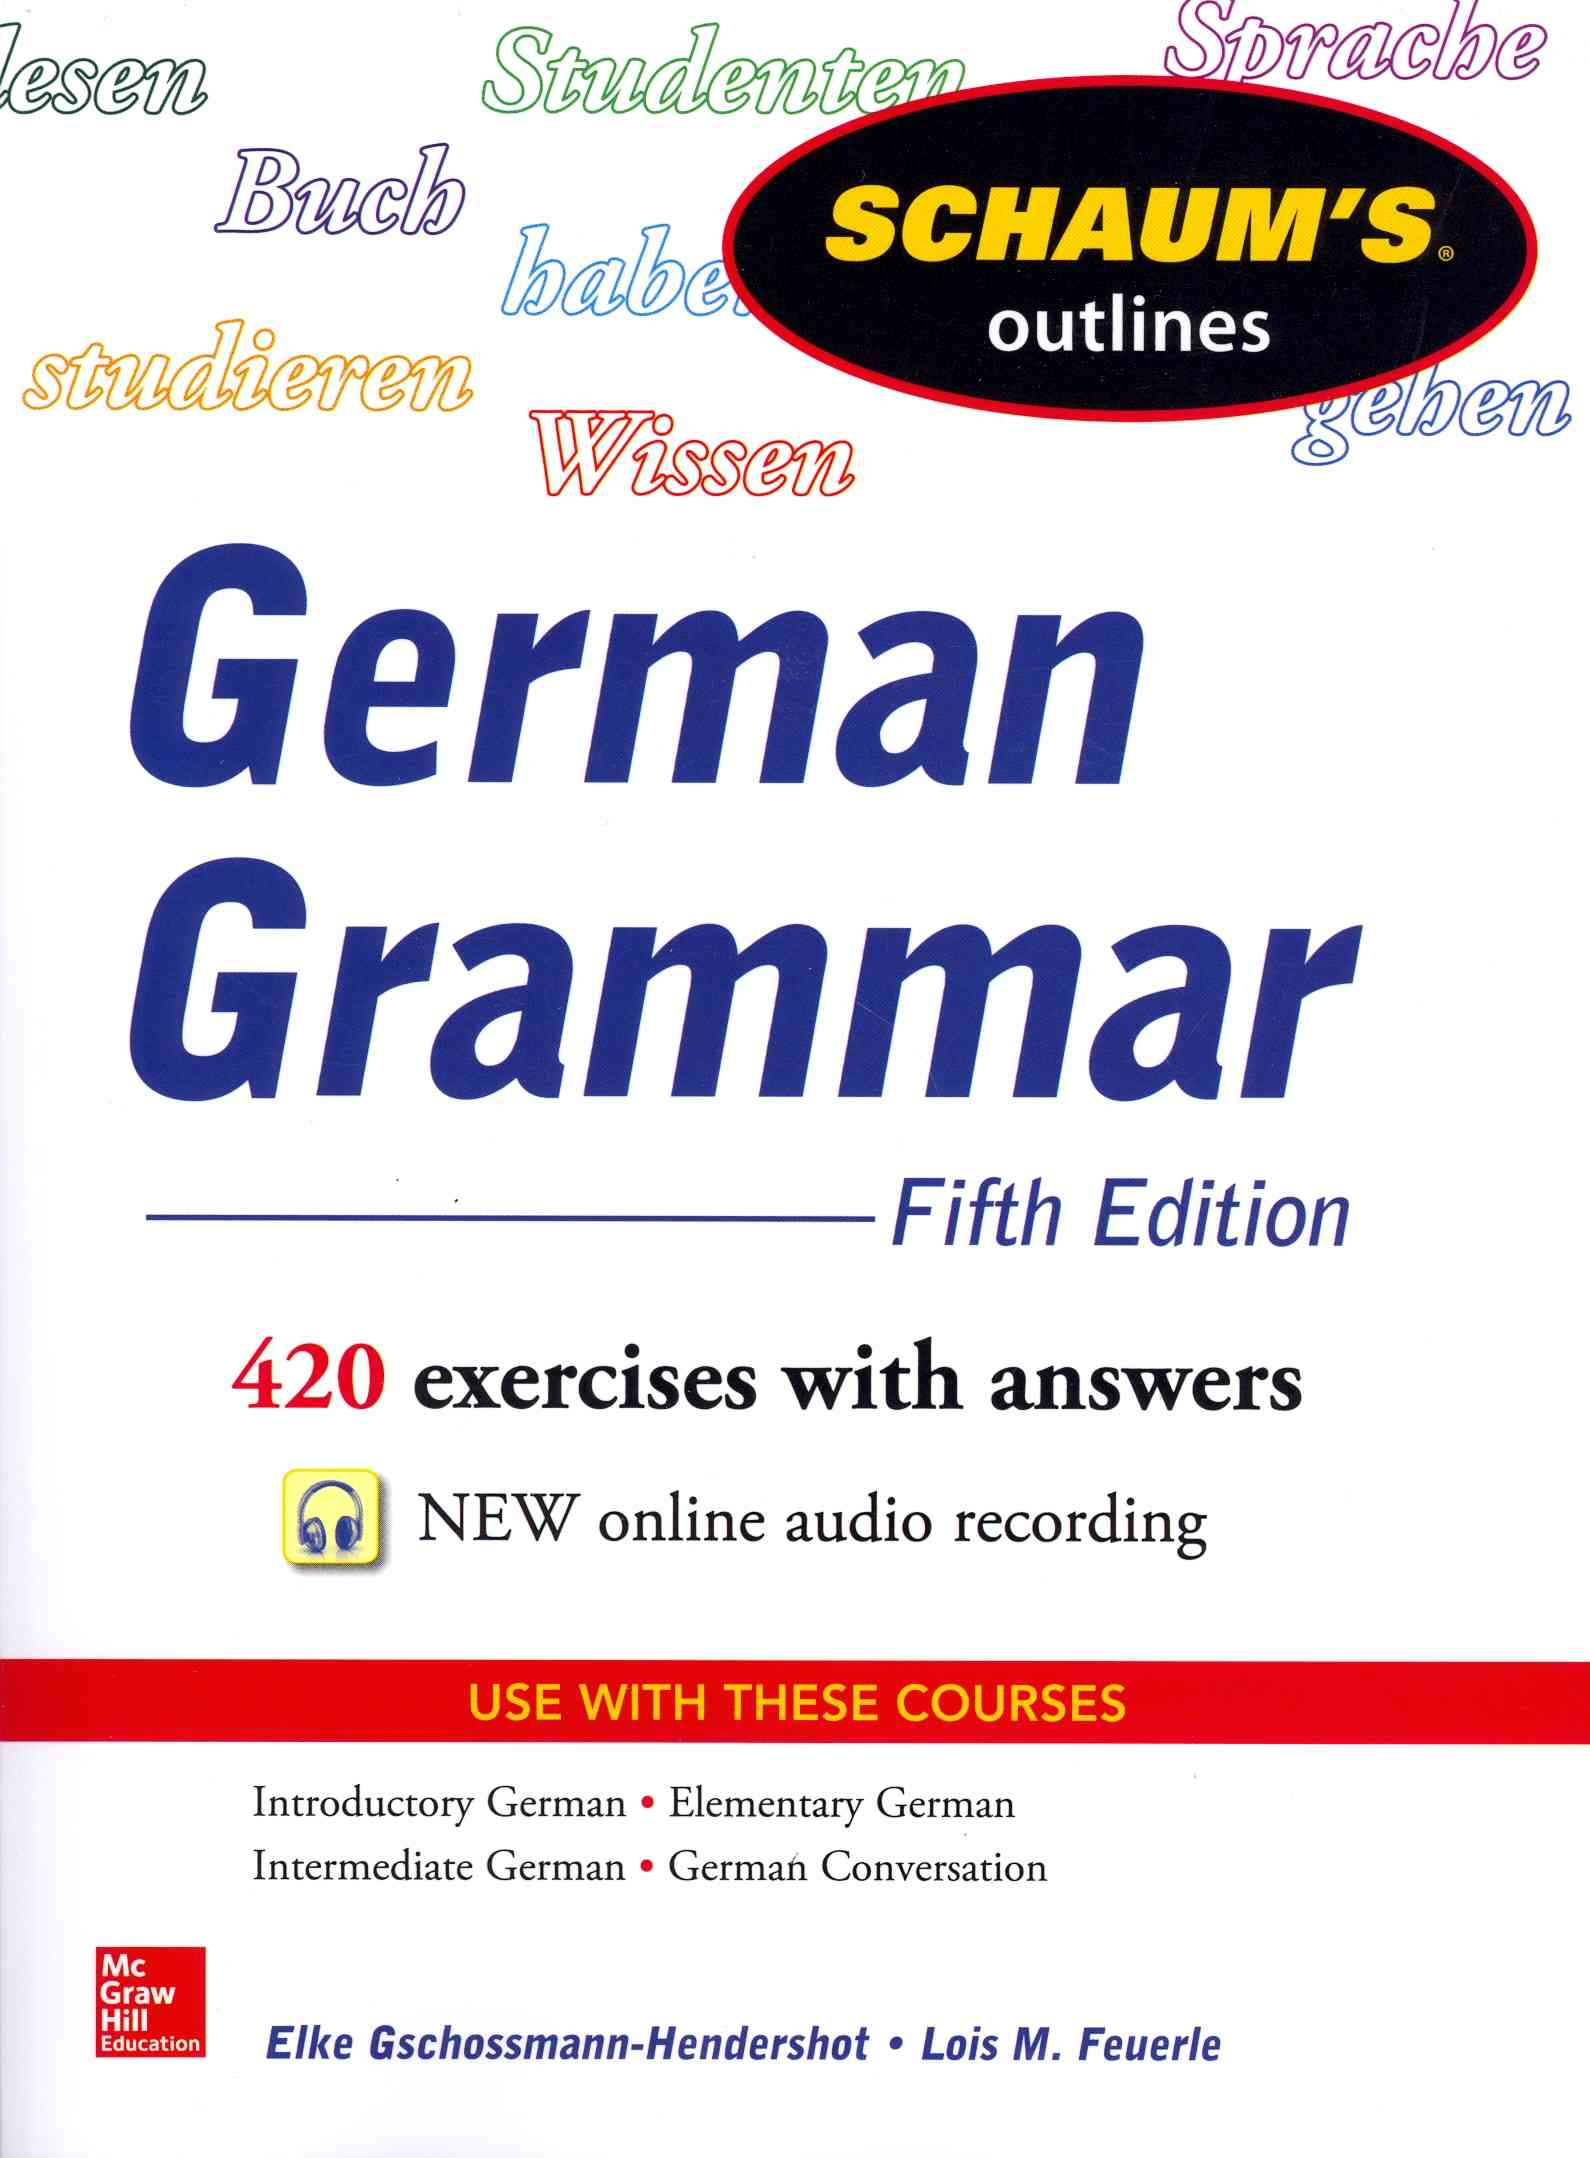 Schaum's Outline of German Grammar By Gschossmann-Hendershot, Elke/ Feuerle, Lois